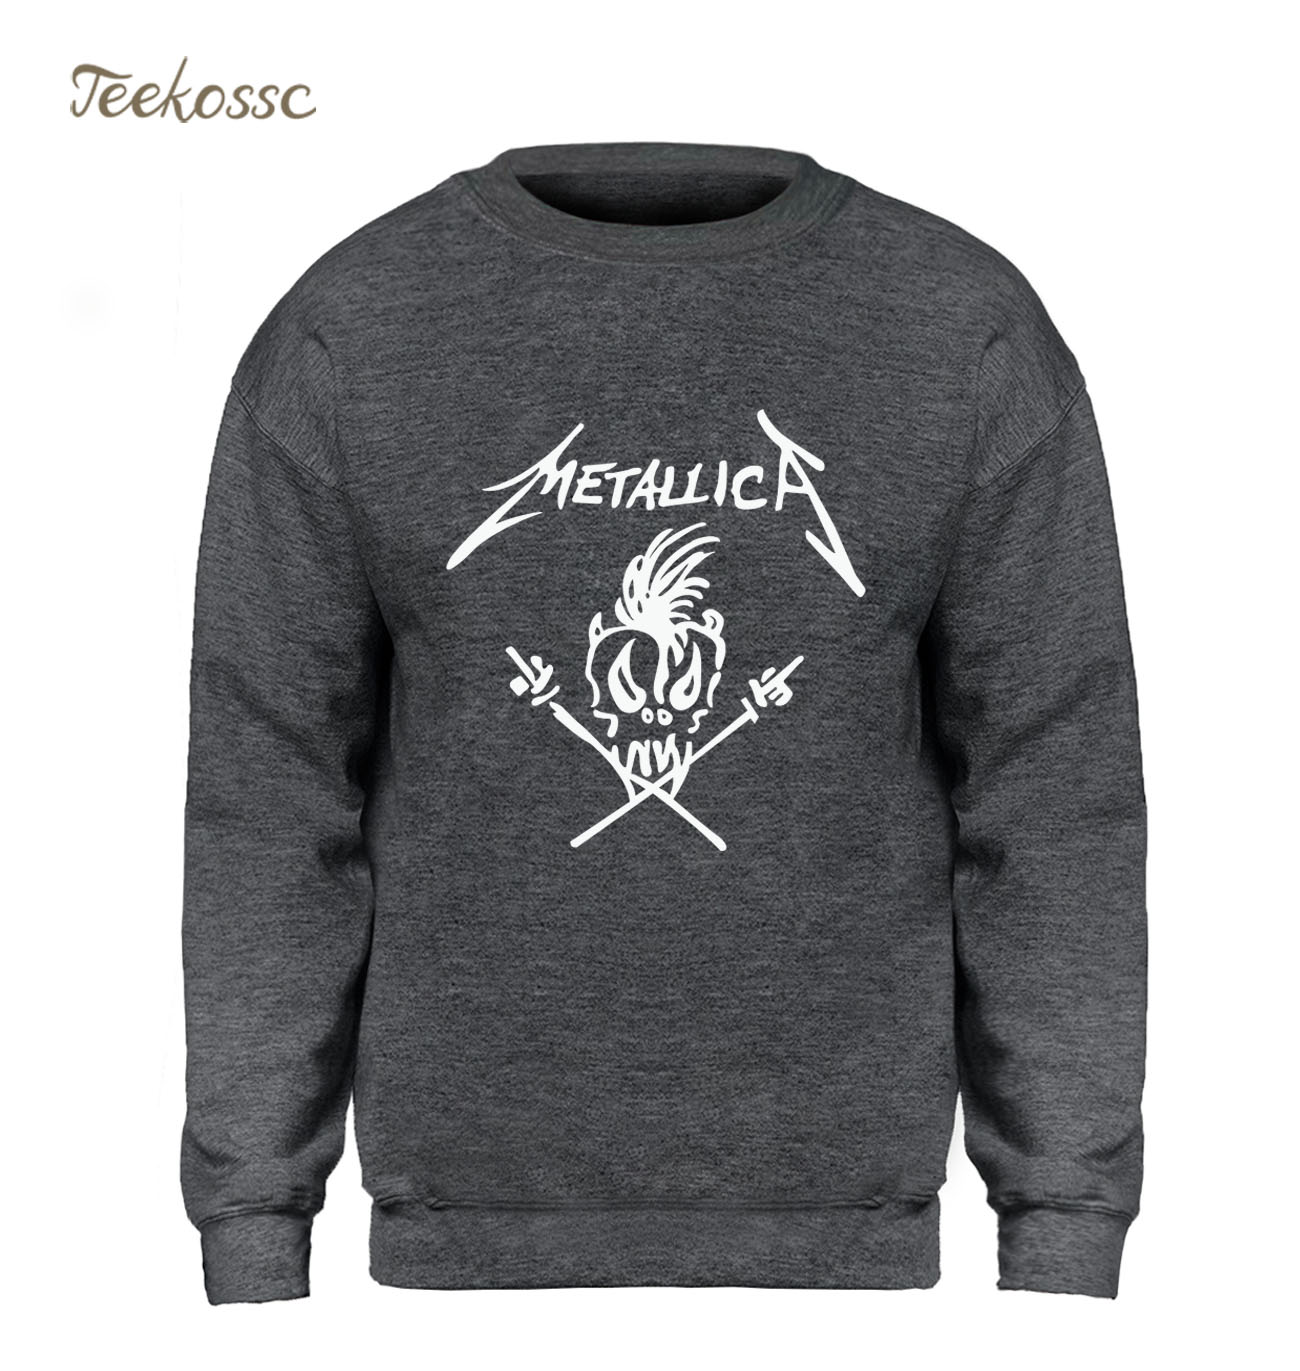 Music Band Punk Rock Hoodie New Fashion Sweatshirt Men Kpop Crewneck Sweatshirts Fleece Warm Hip Hop Sportswear